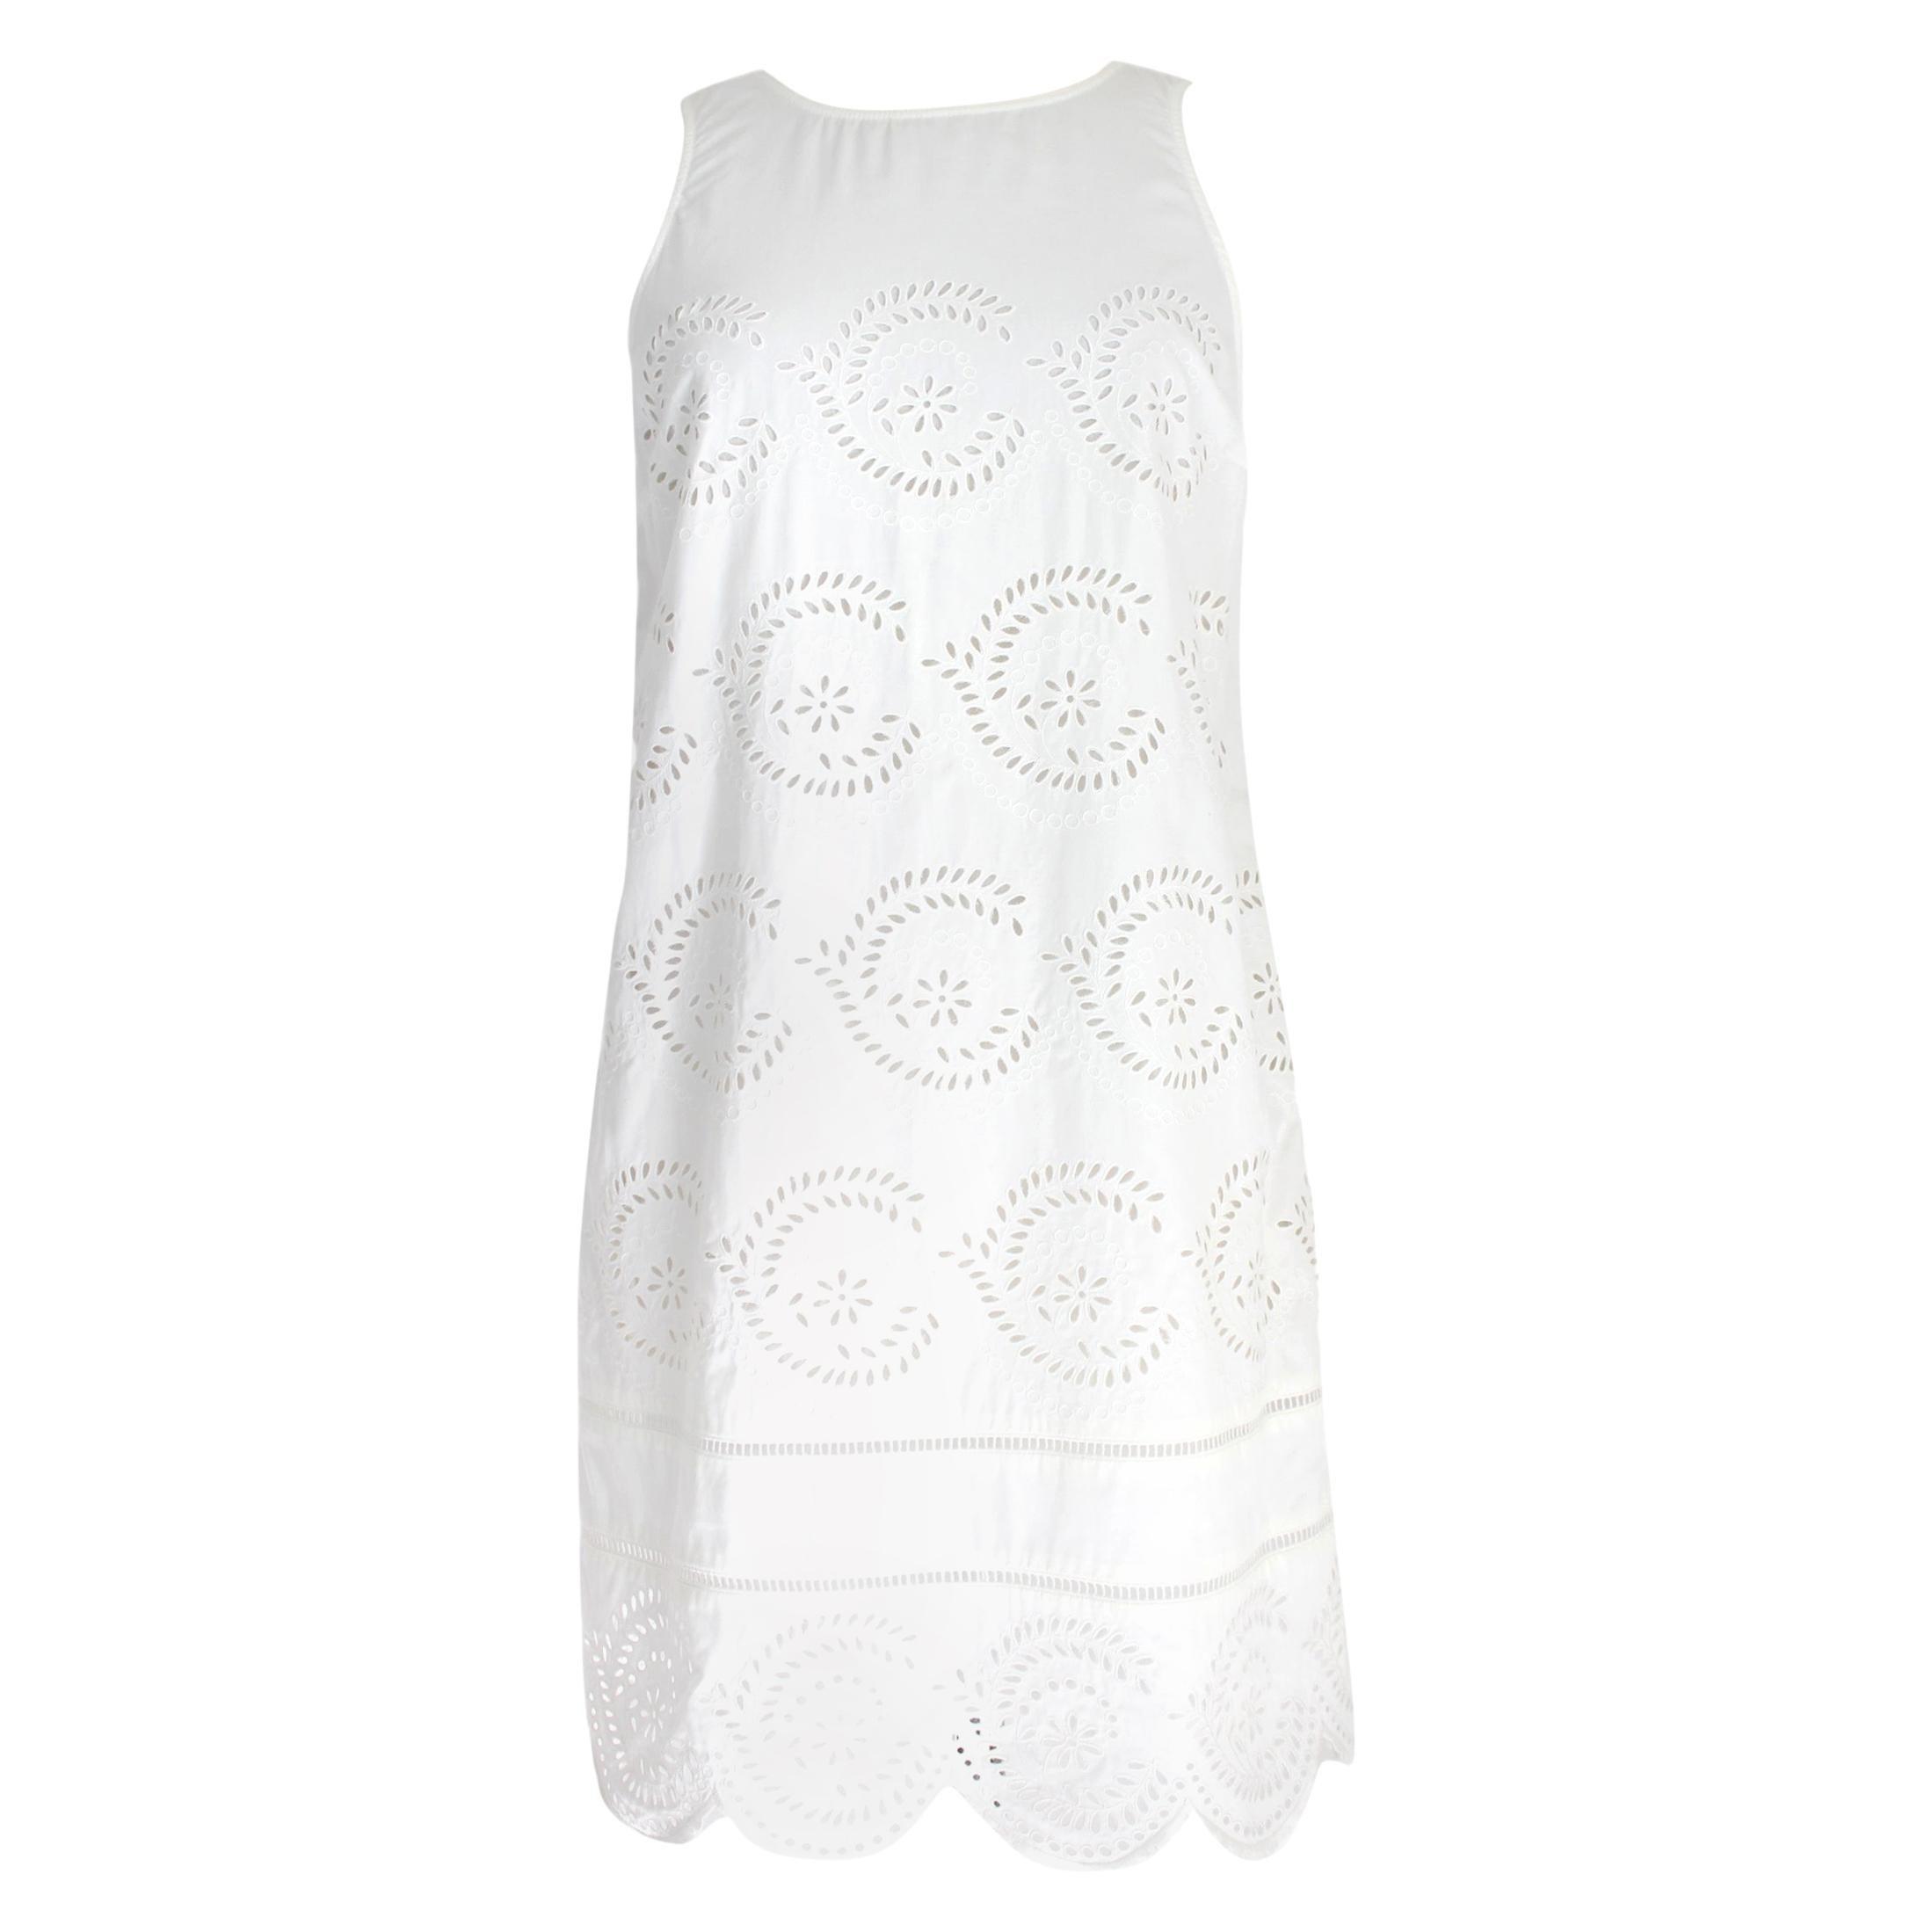 Marc Jacobs White Cotton Lace Floral Marshmallow A Line Summer Dress